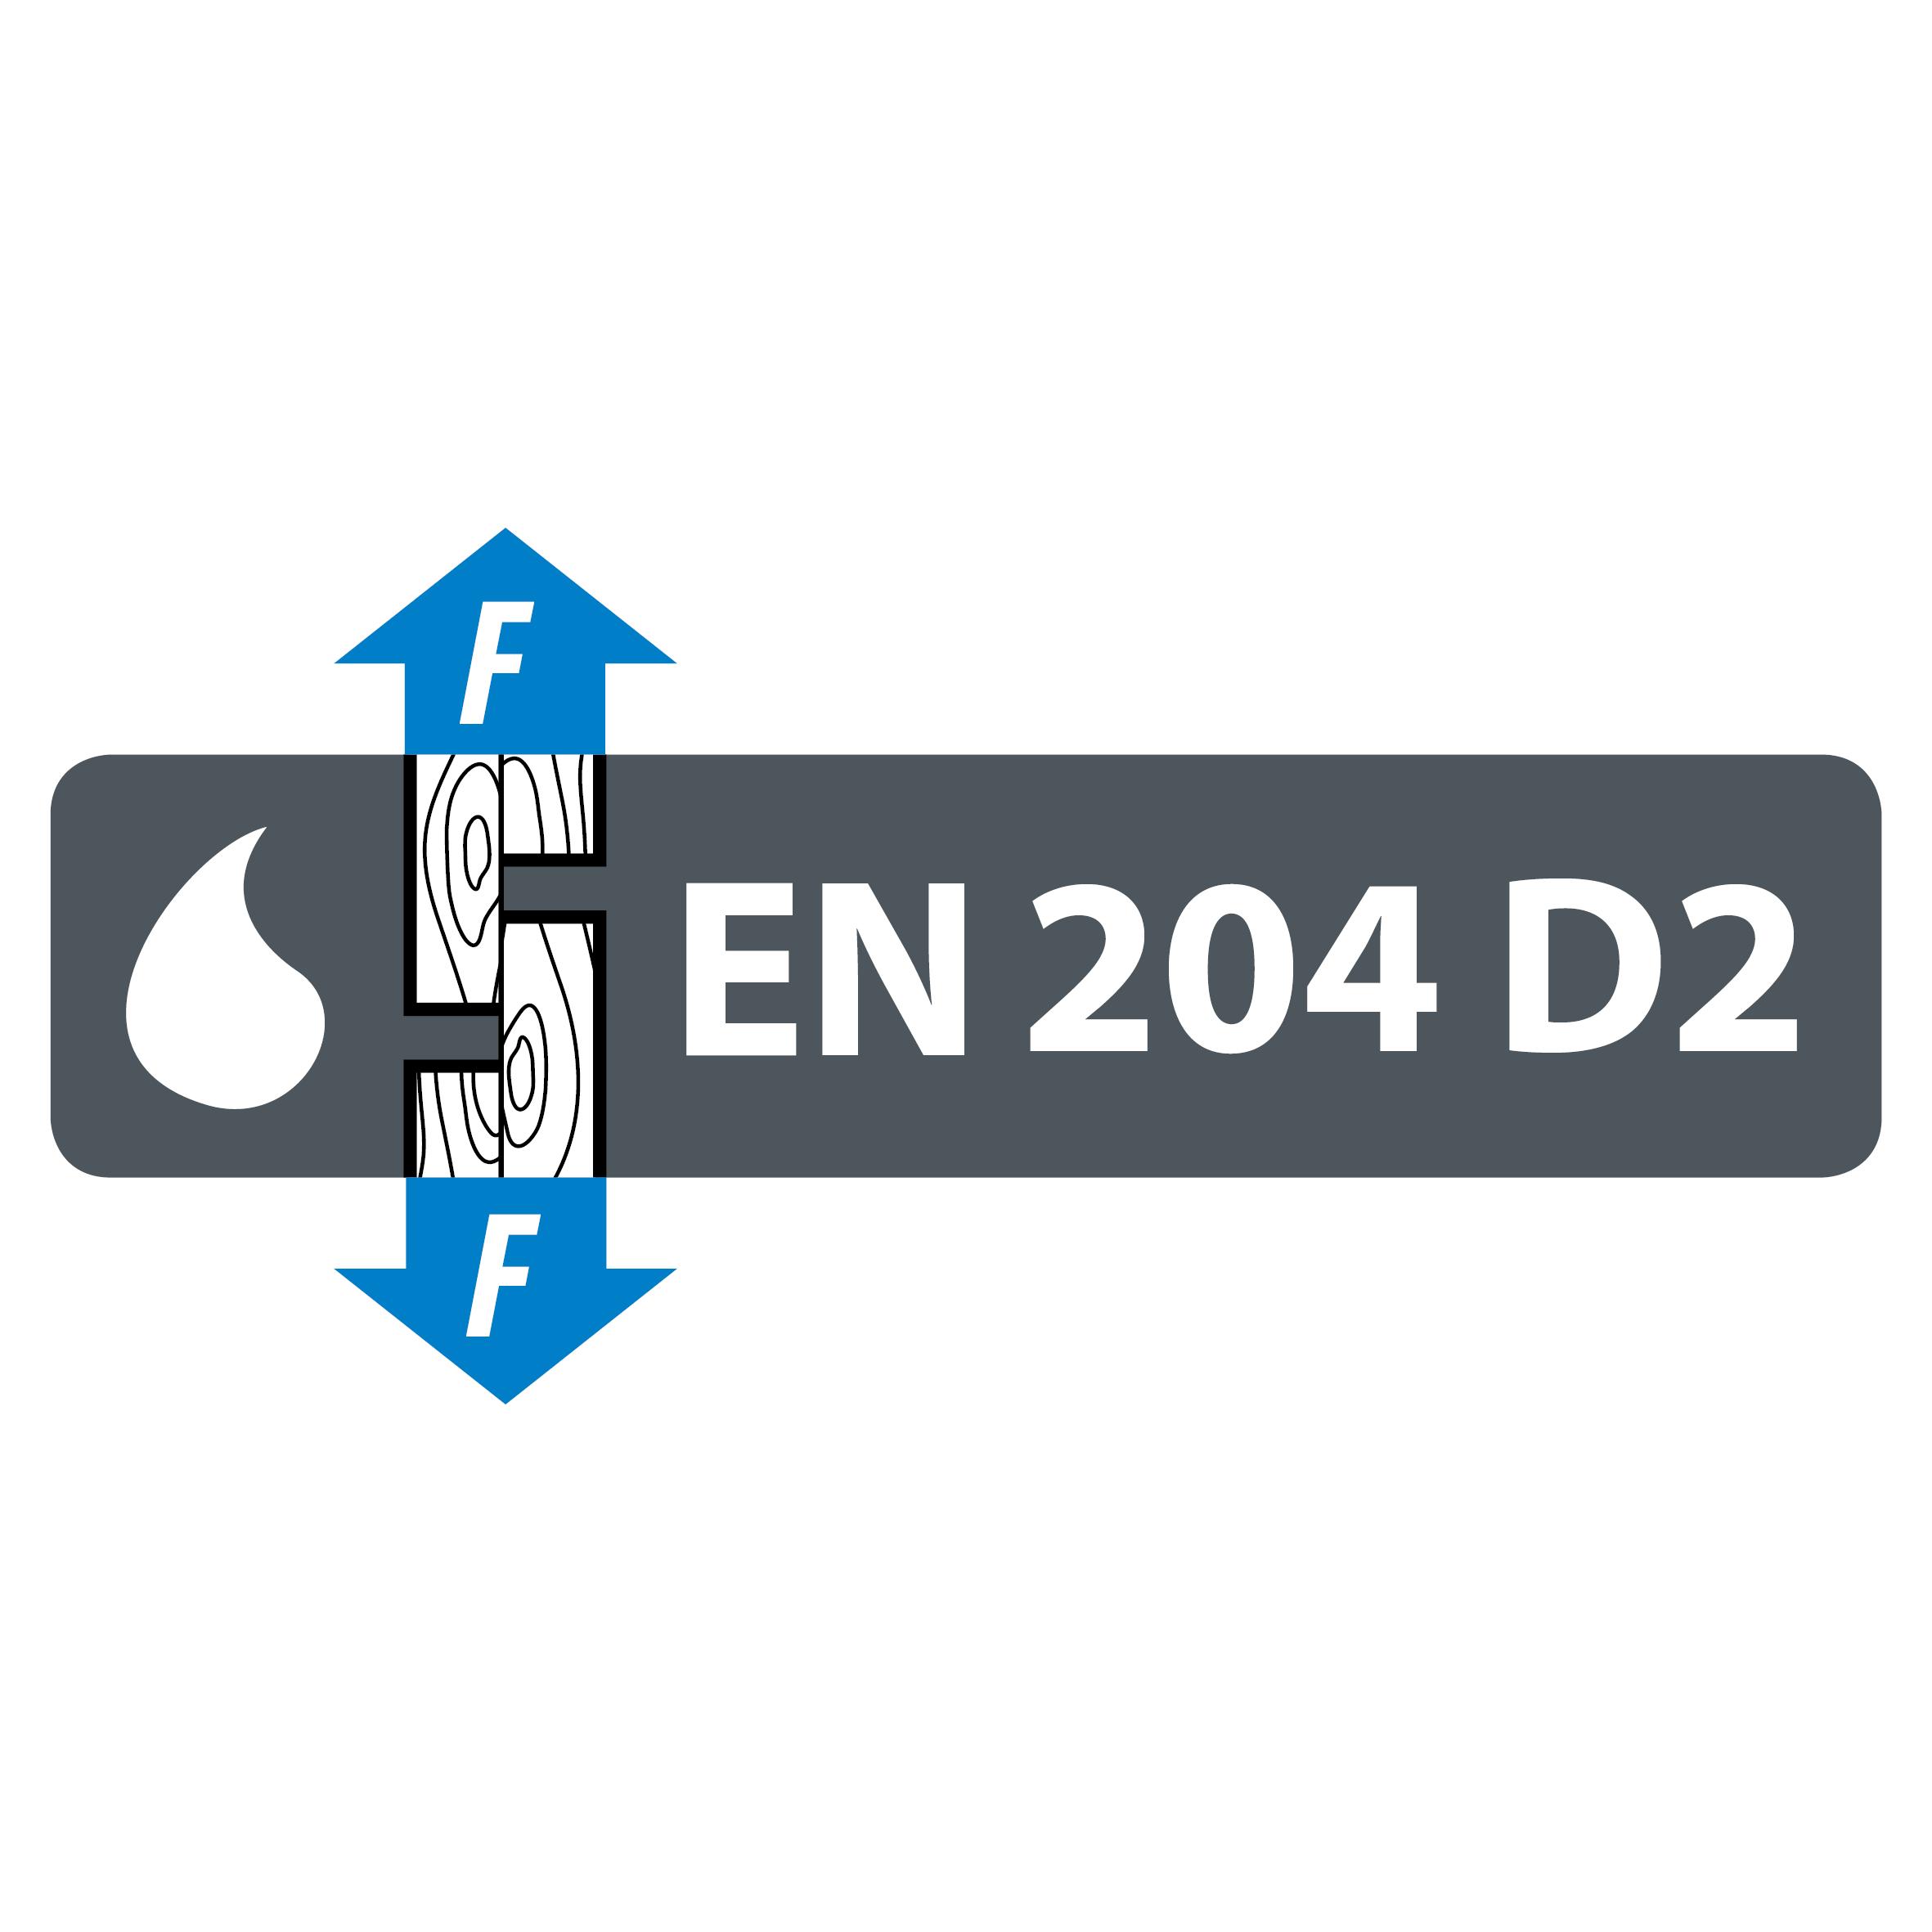 EN 204 D2 -vedenkestoluokitus